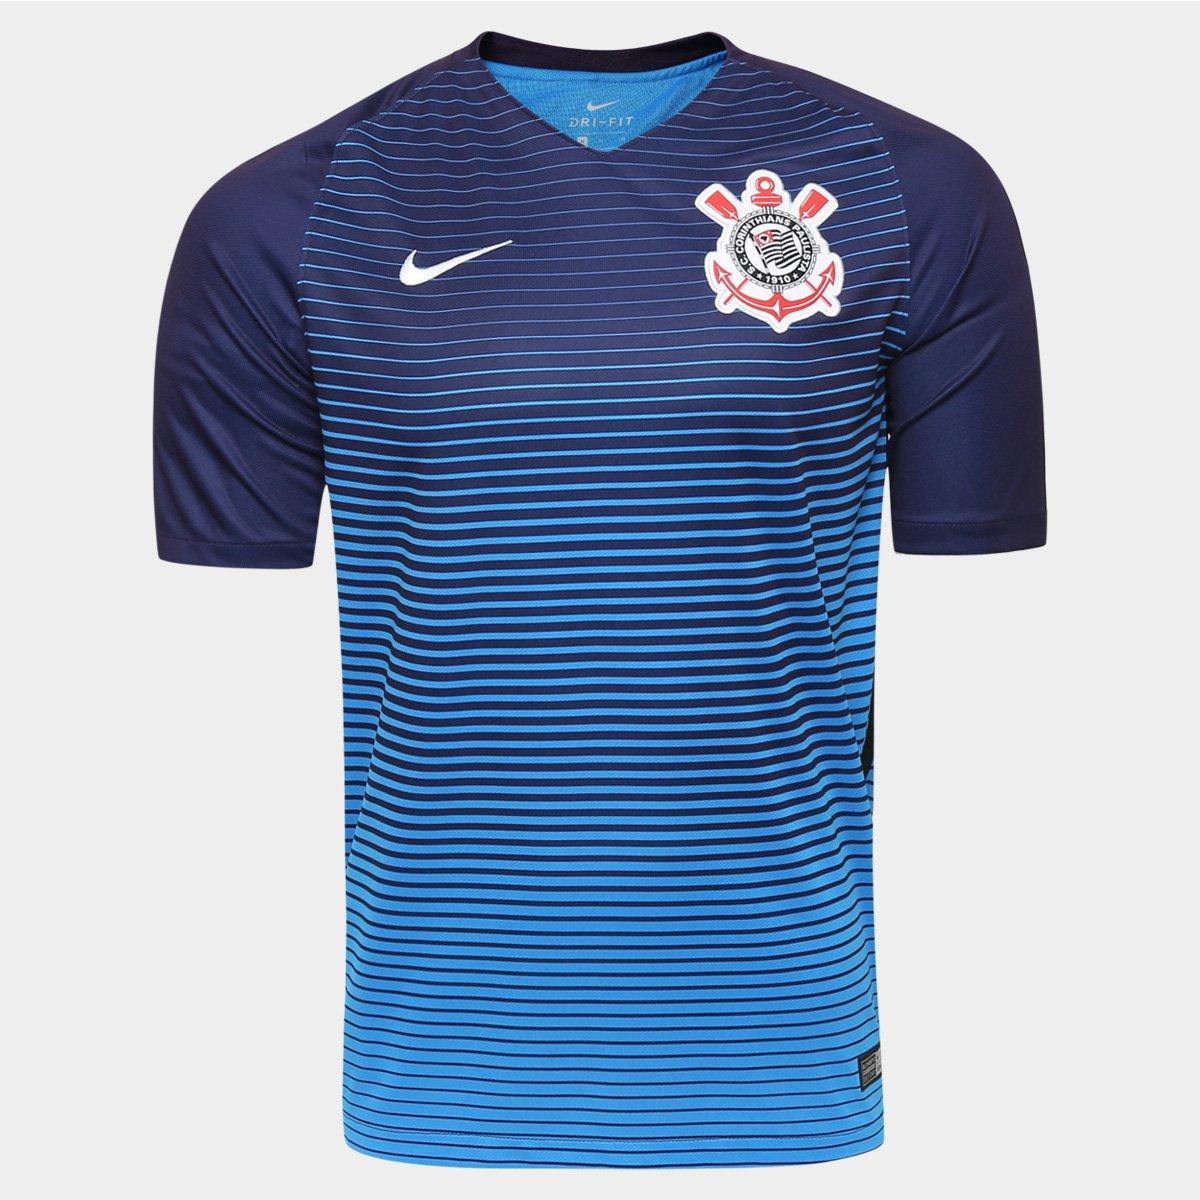 Camisa Corinthians III 2016 s nº Torcedor Nike Masculina - Compre ... 5313b30c3cb7c